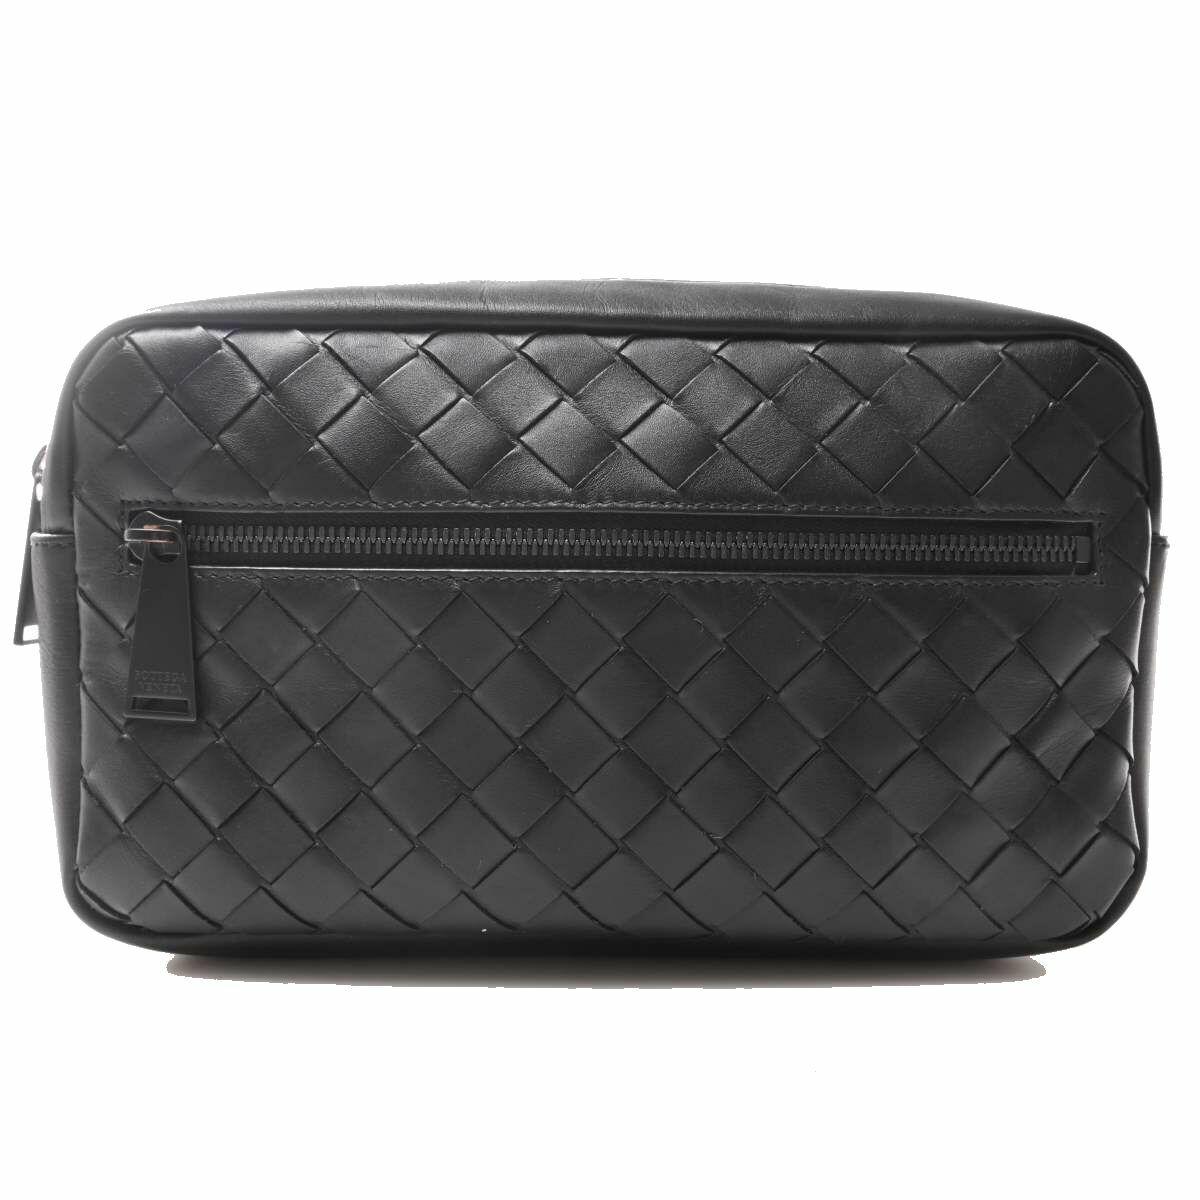 Bottega Veneta Leather Intrecciato Waist Bag Black